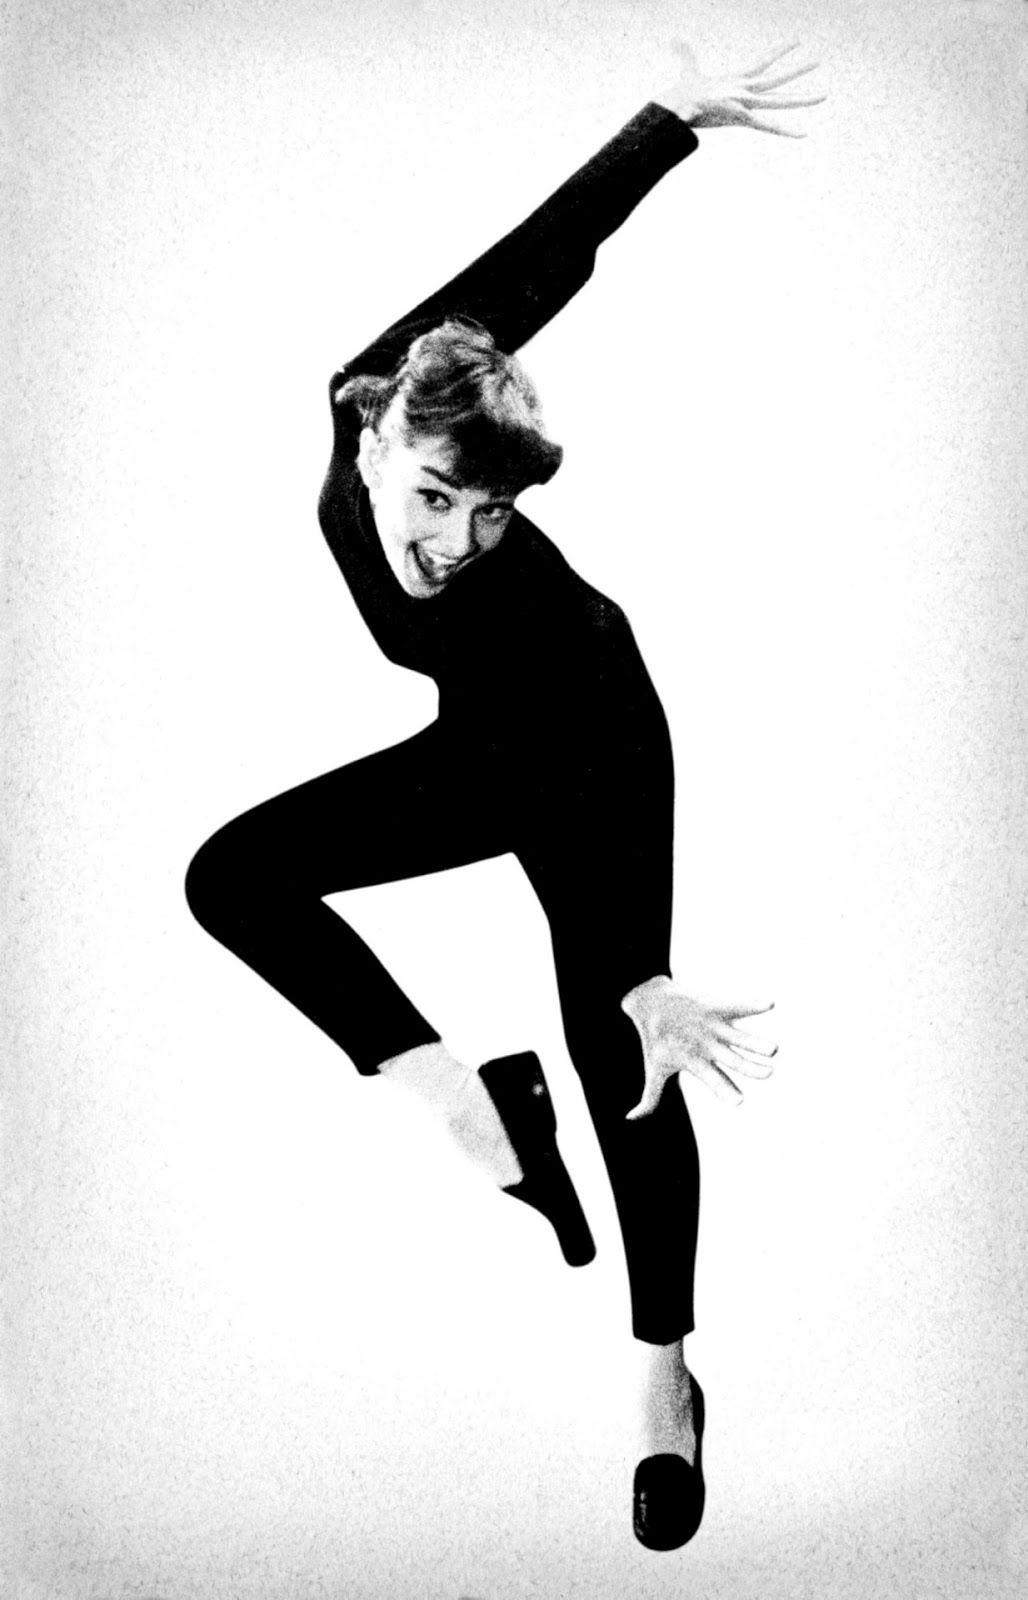 Audrey hepburn black cigarette pants google search for Audrey hepburn pictures to buy